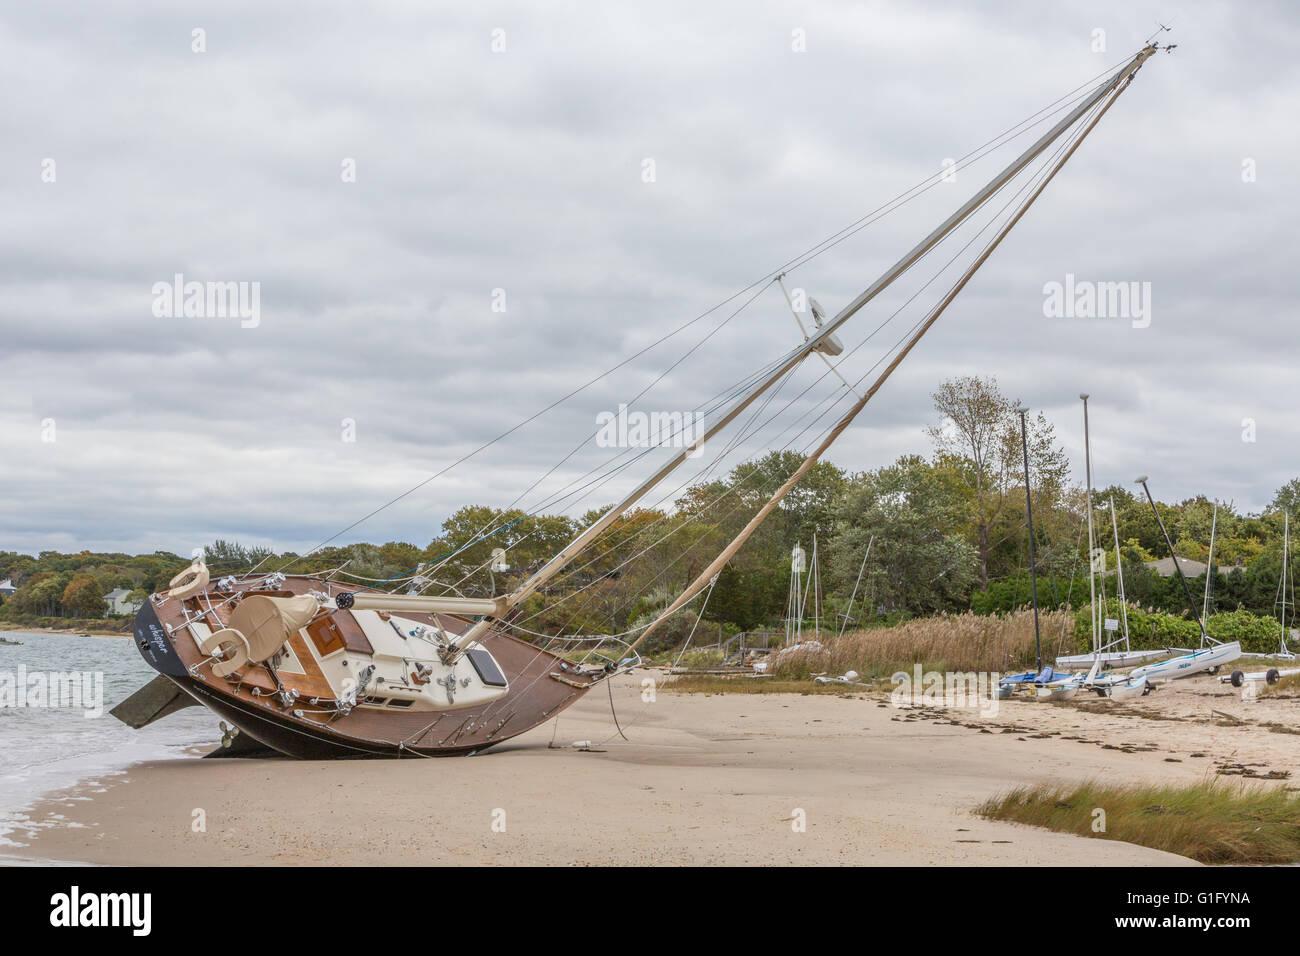 Beached sailboat on Haven's Beach, Sag Harbor, NY - Stock Image